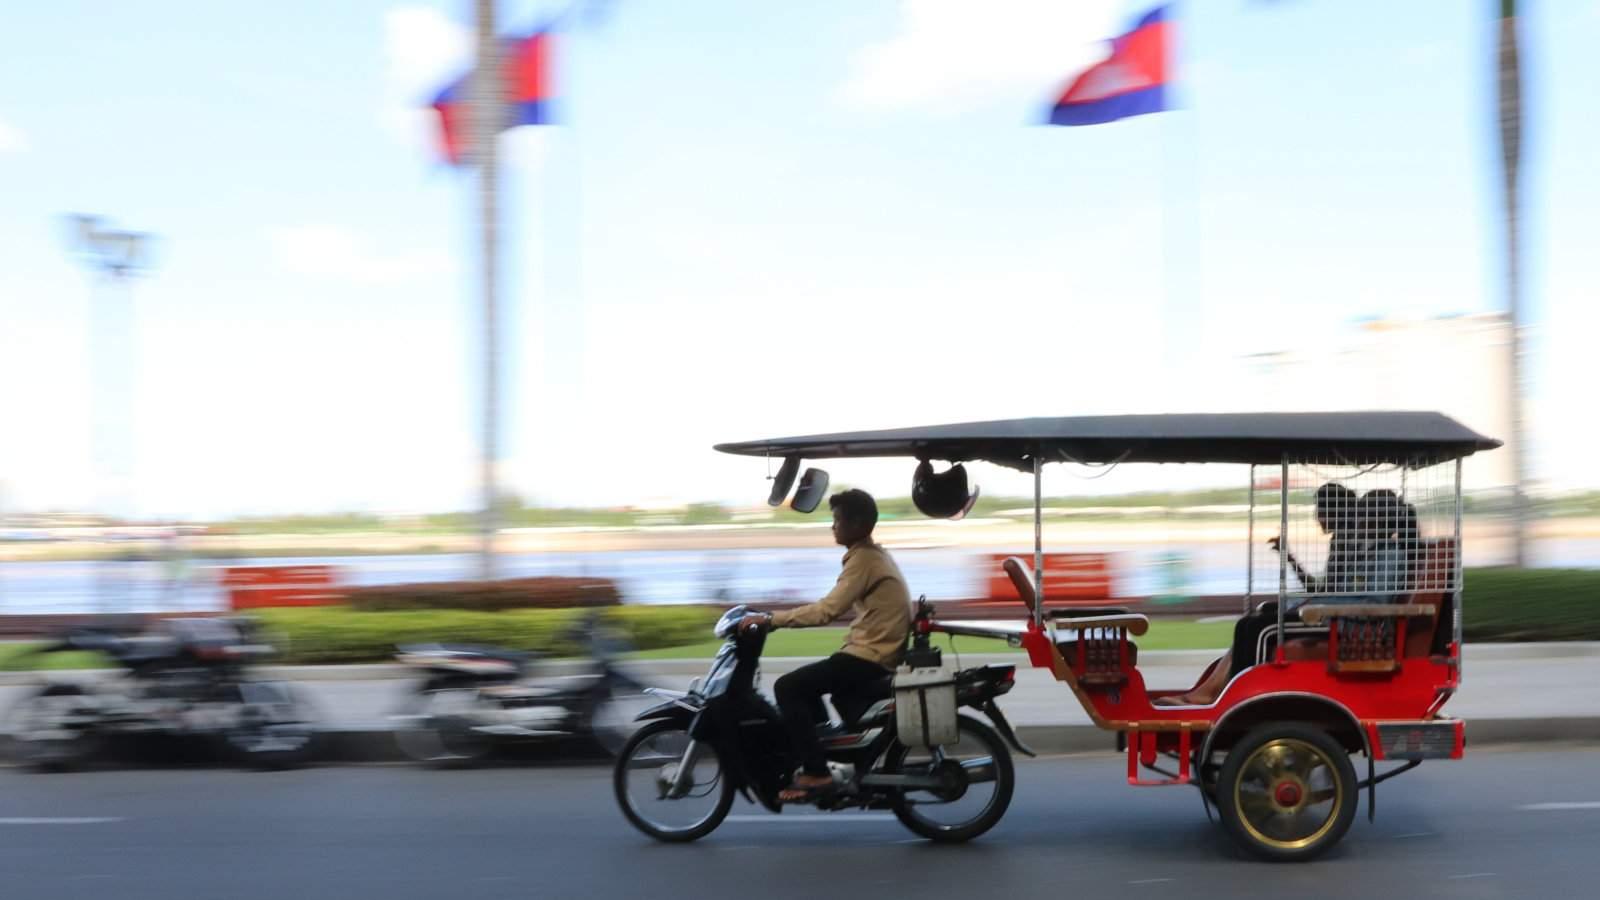 Tuk-tuks are one of the best ways to explore Phnom Penh